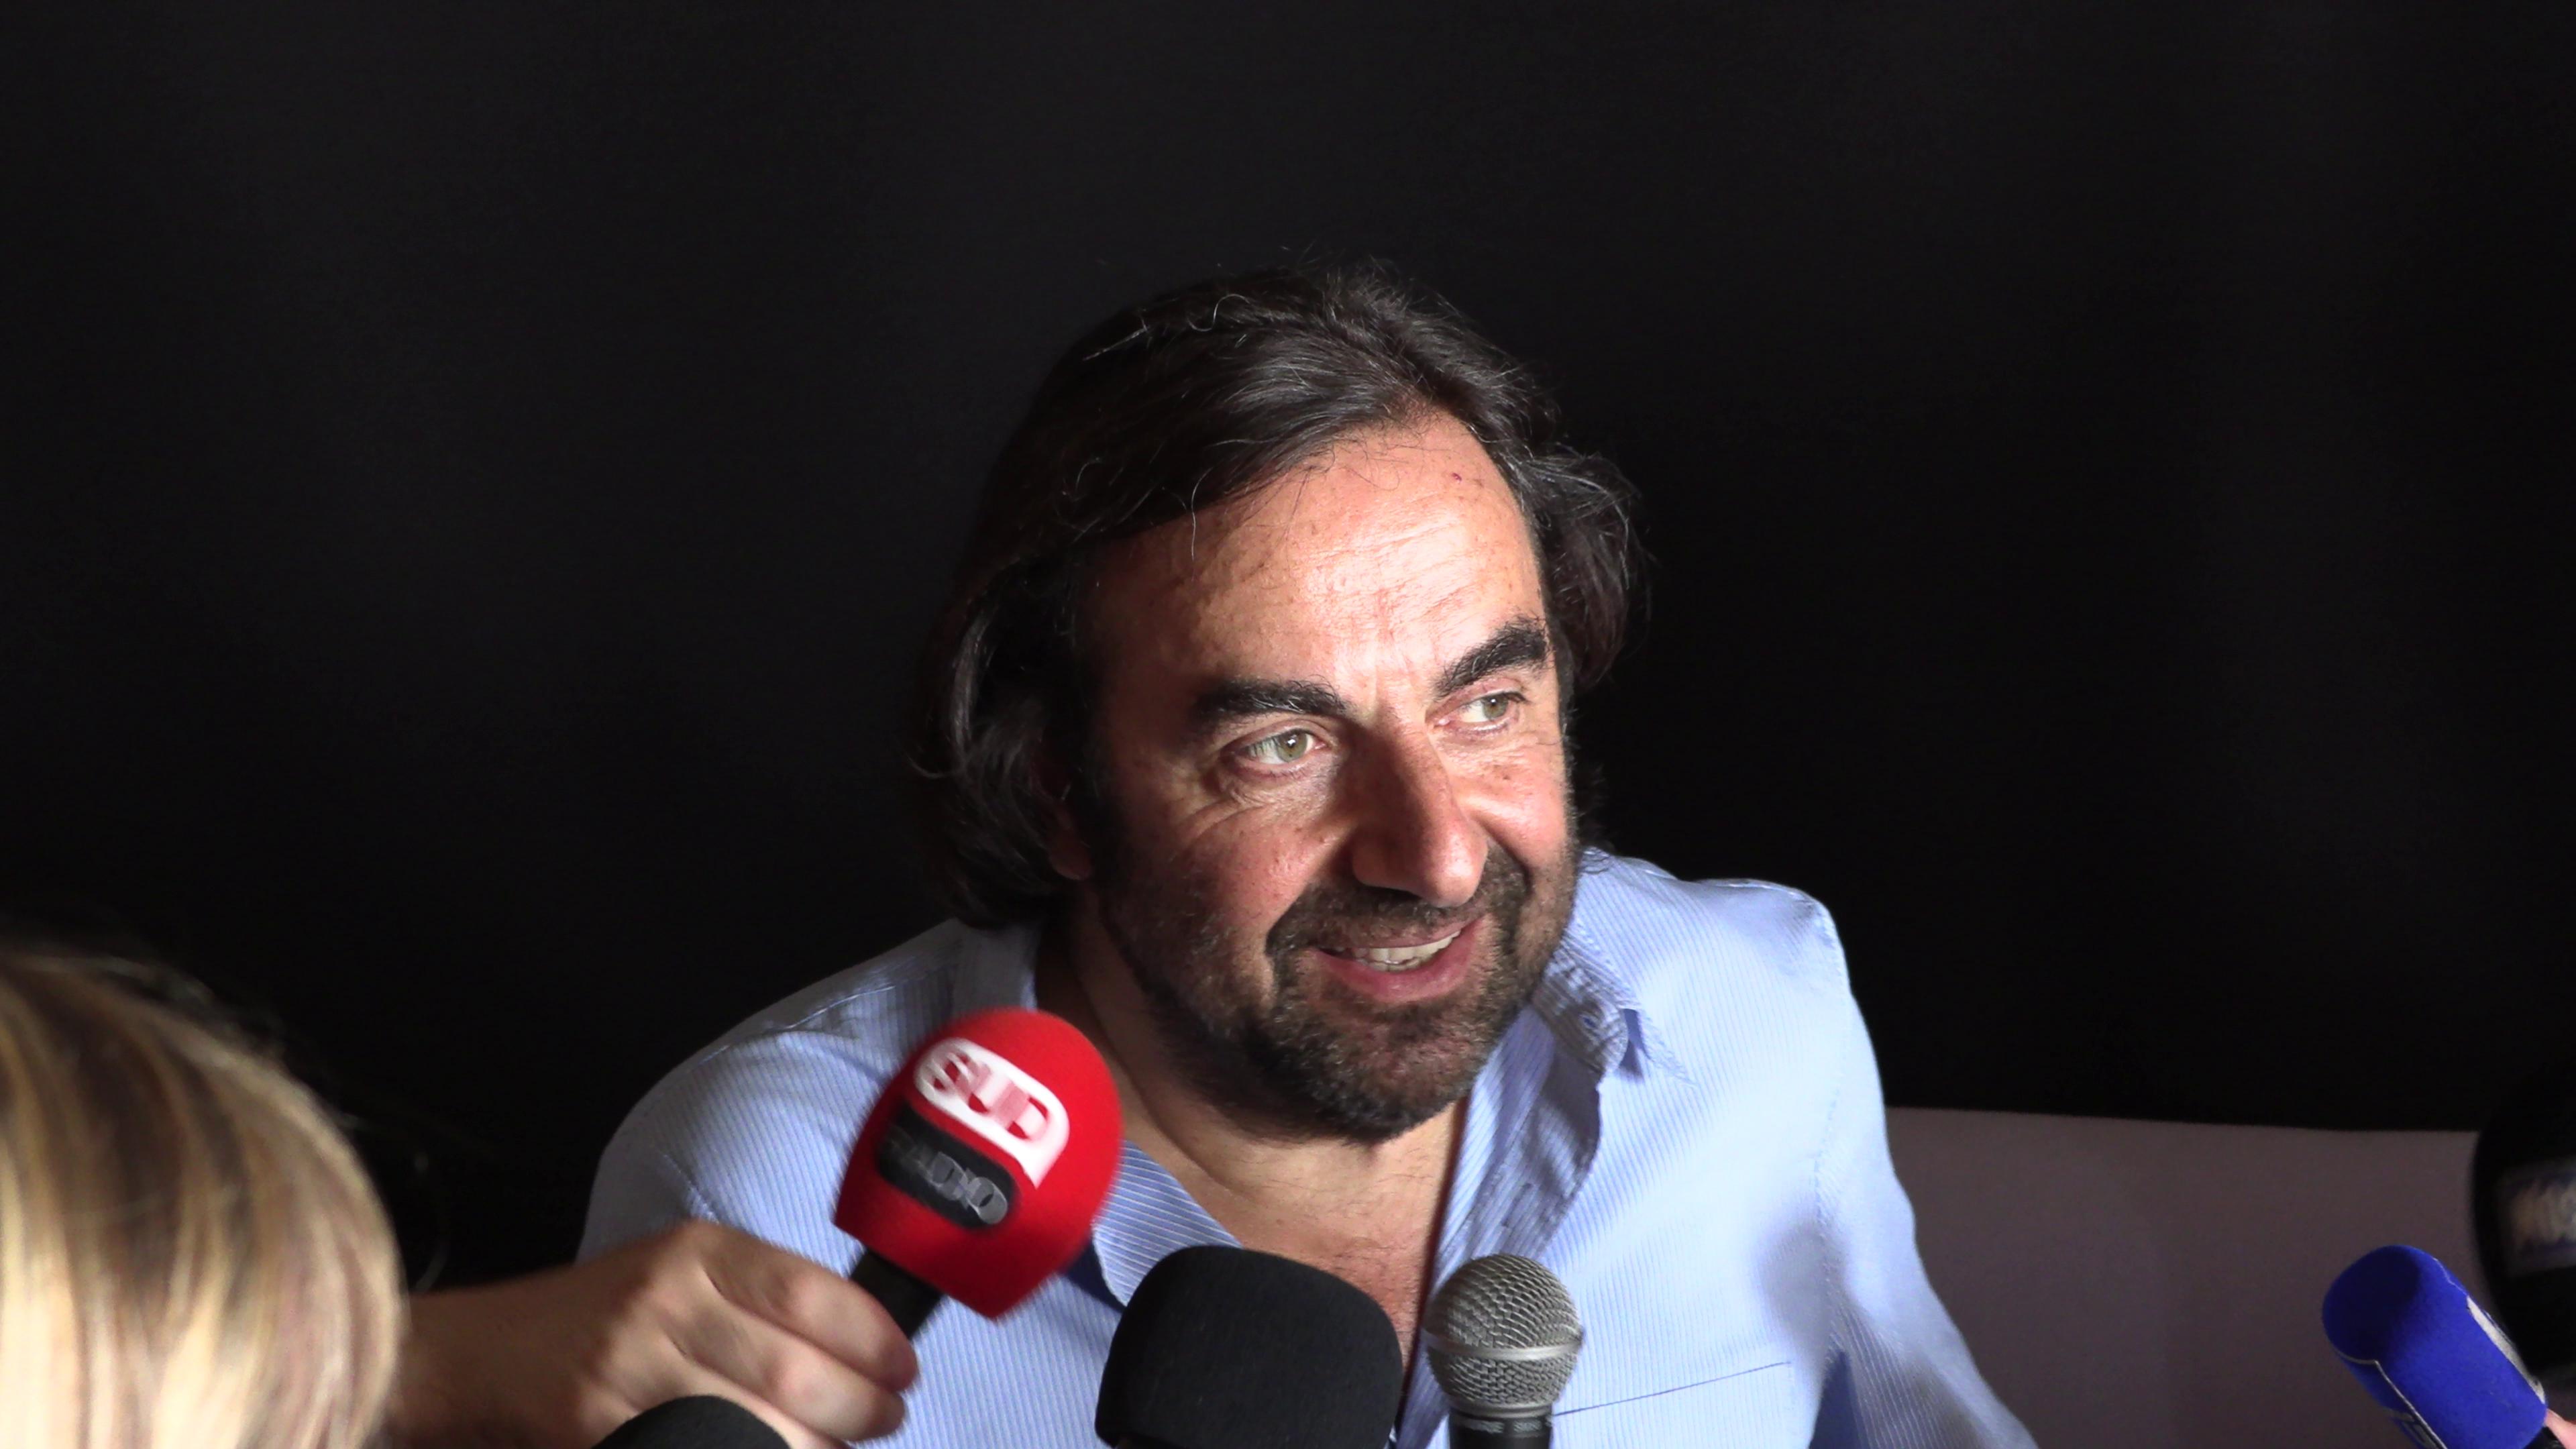 Manoukian Francos 2019 AUNISTV